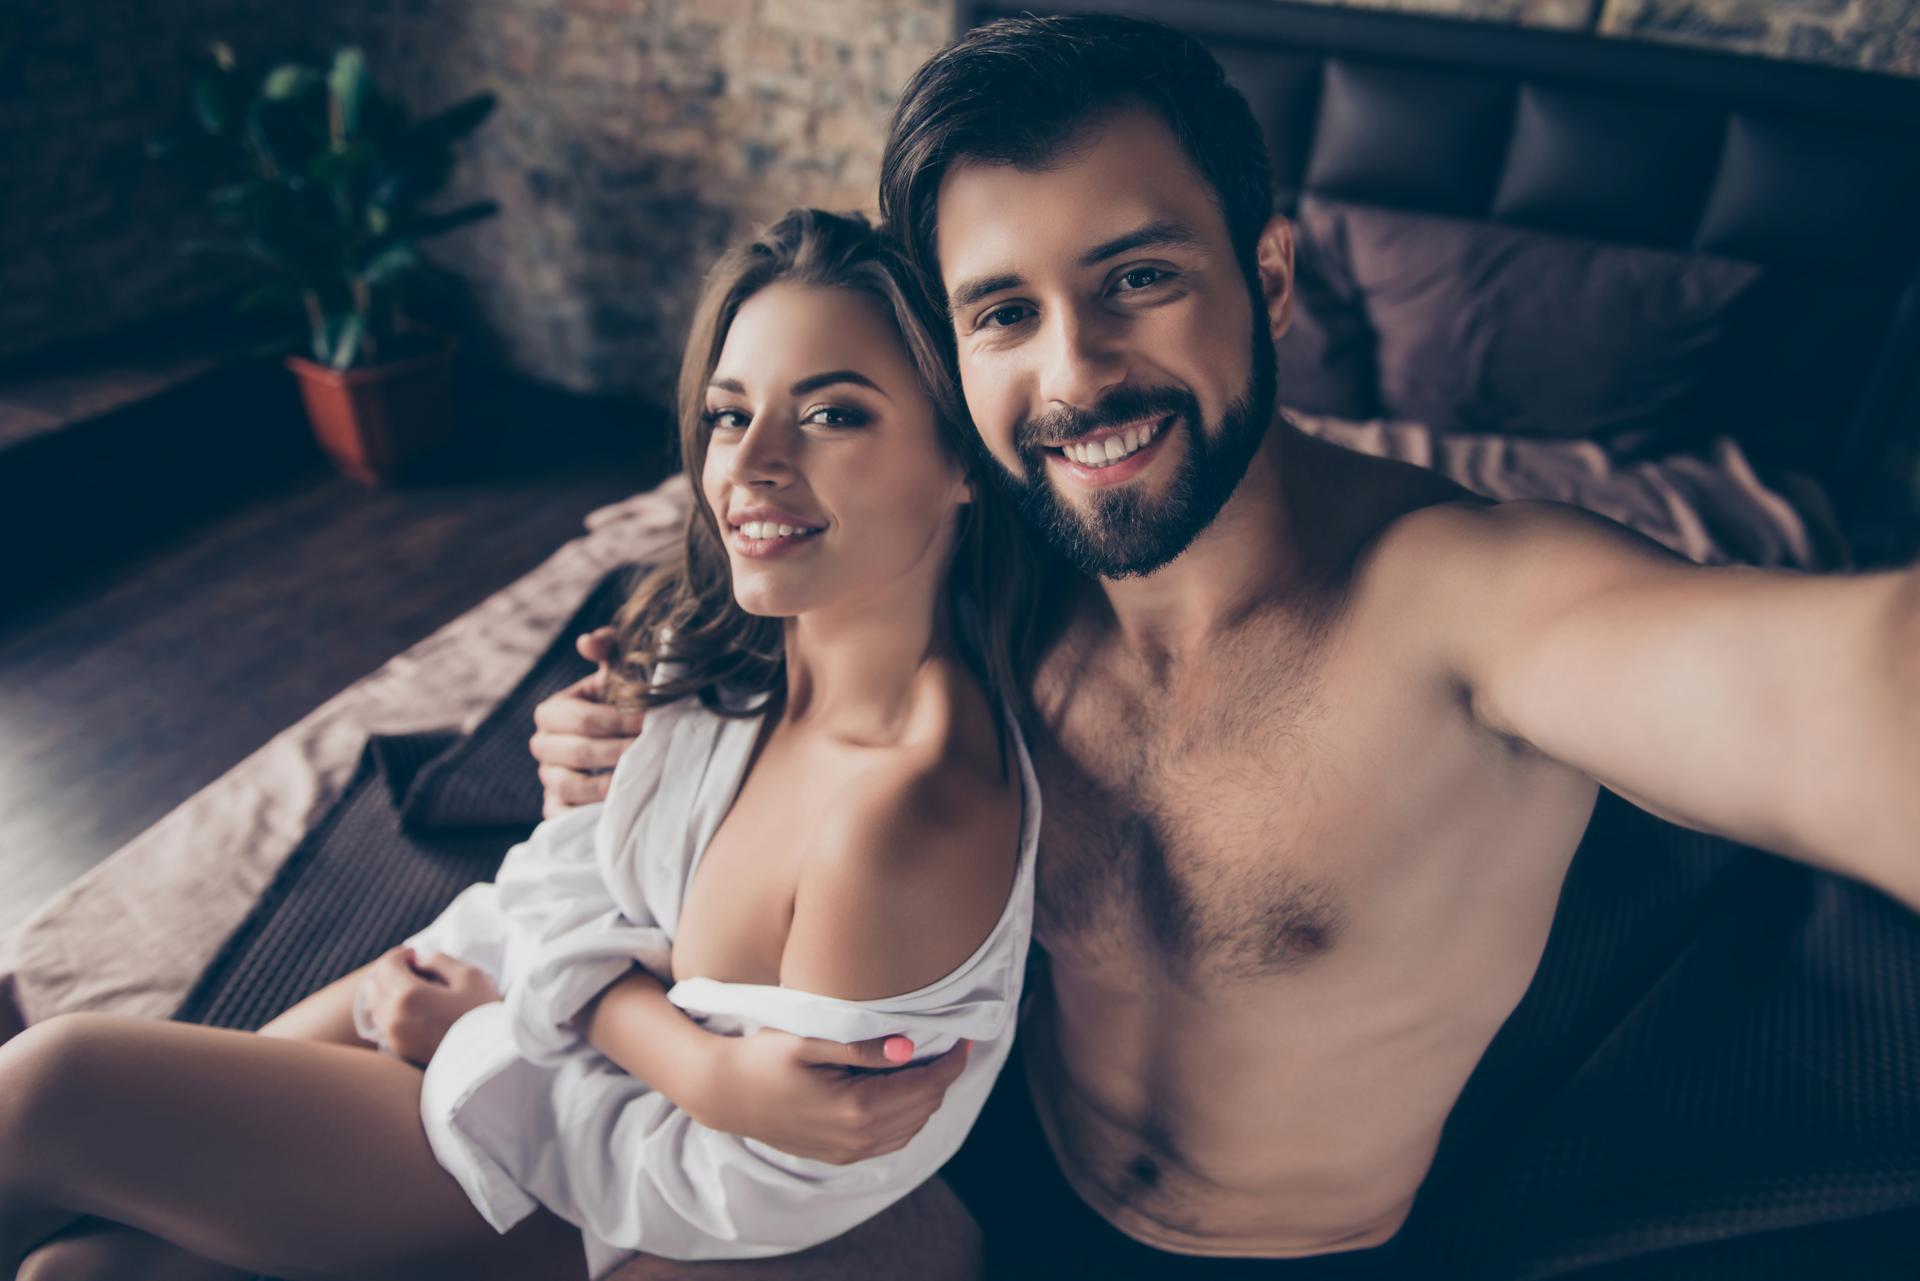 Pornofilme Sexkontakte XXX.